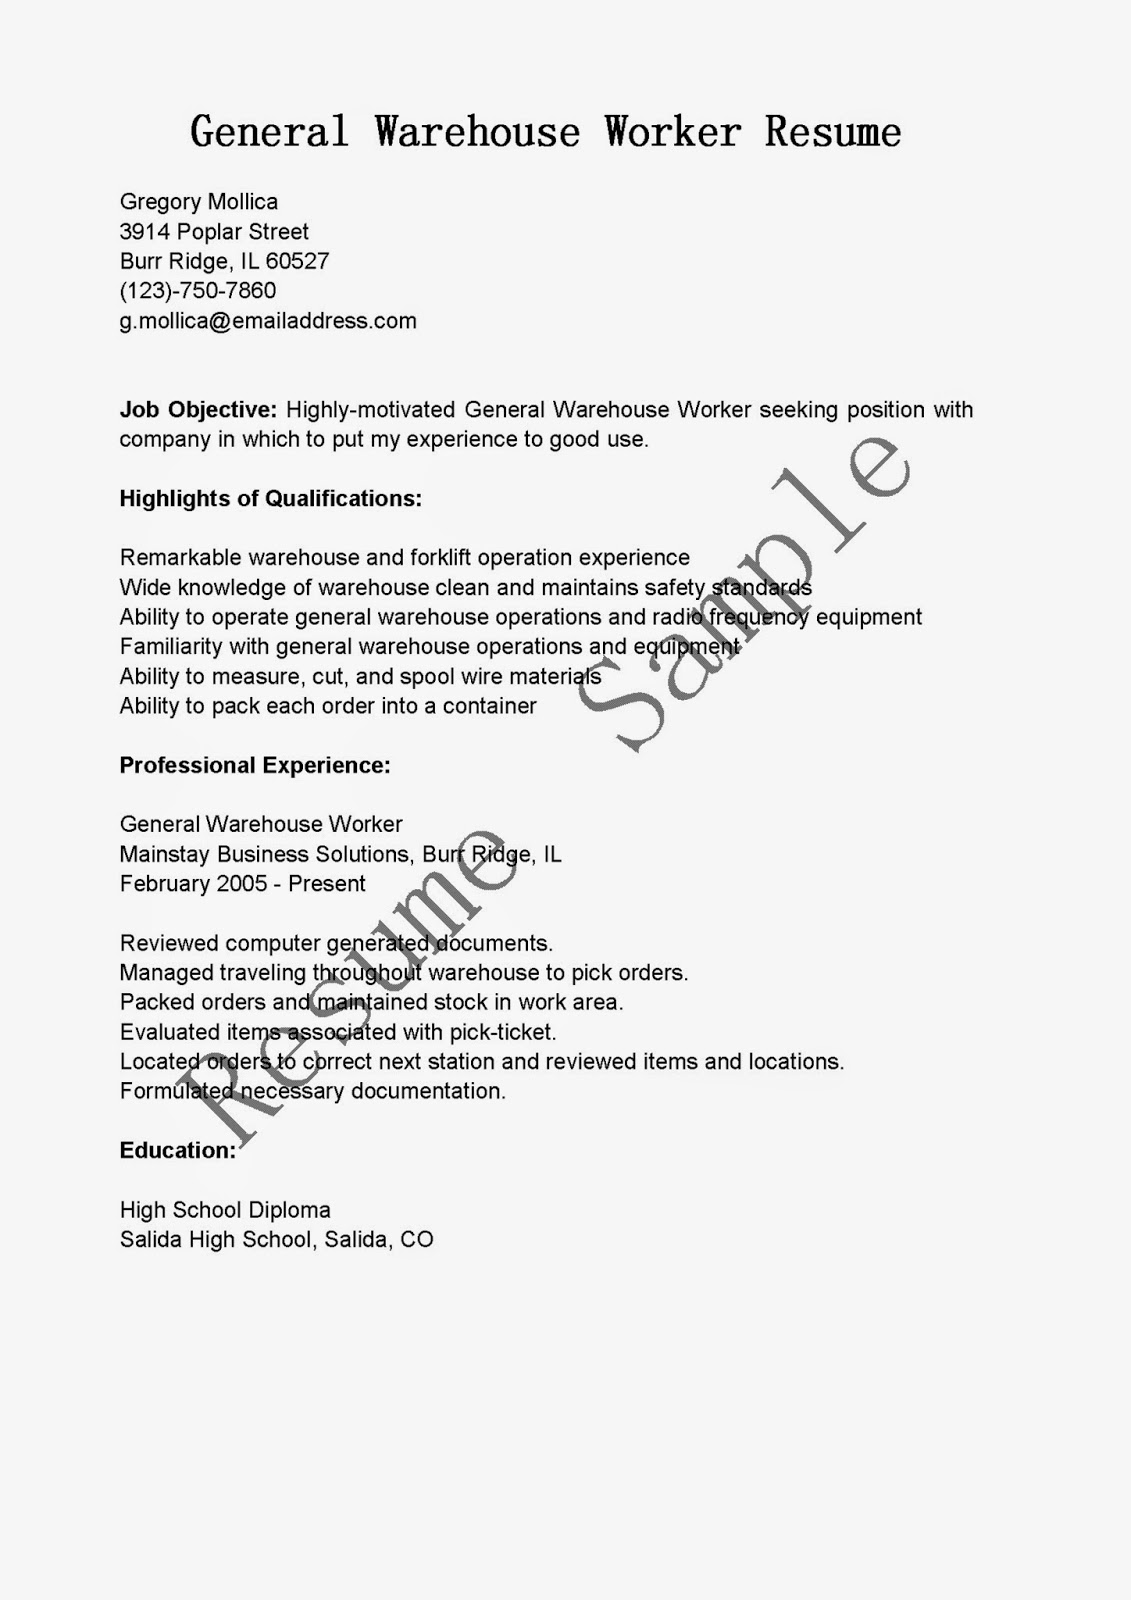 Retail Store Associate Resume Sample Retail Store Associate Resume Diamond  Geo Engineering Services Retail Store Associate  Stock Associate Resume